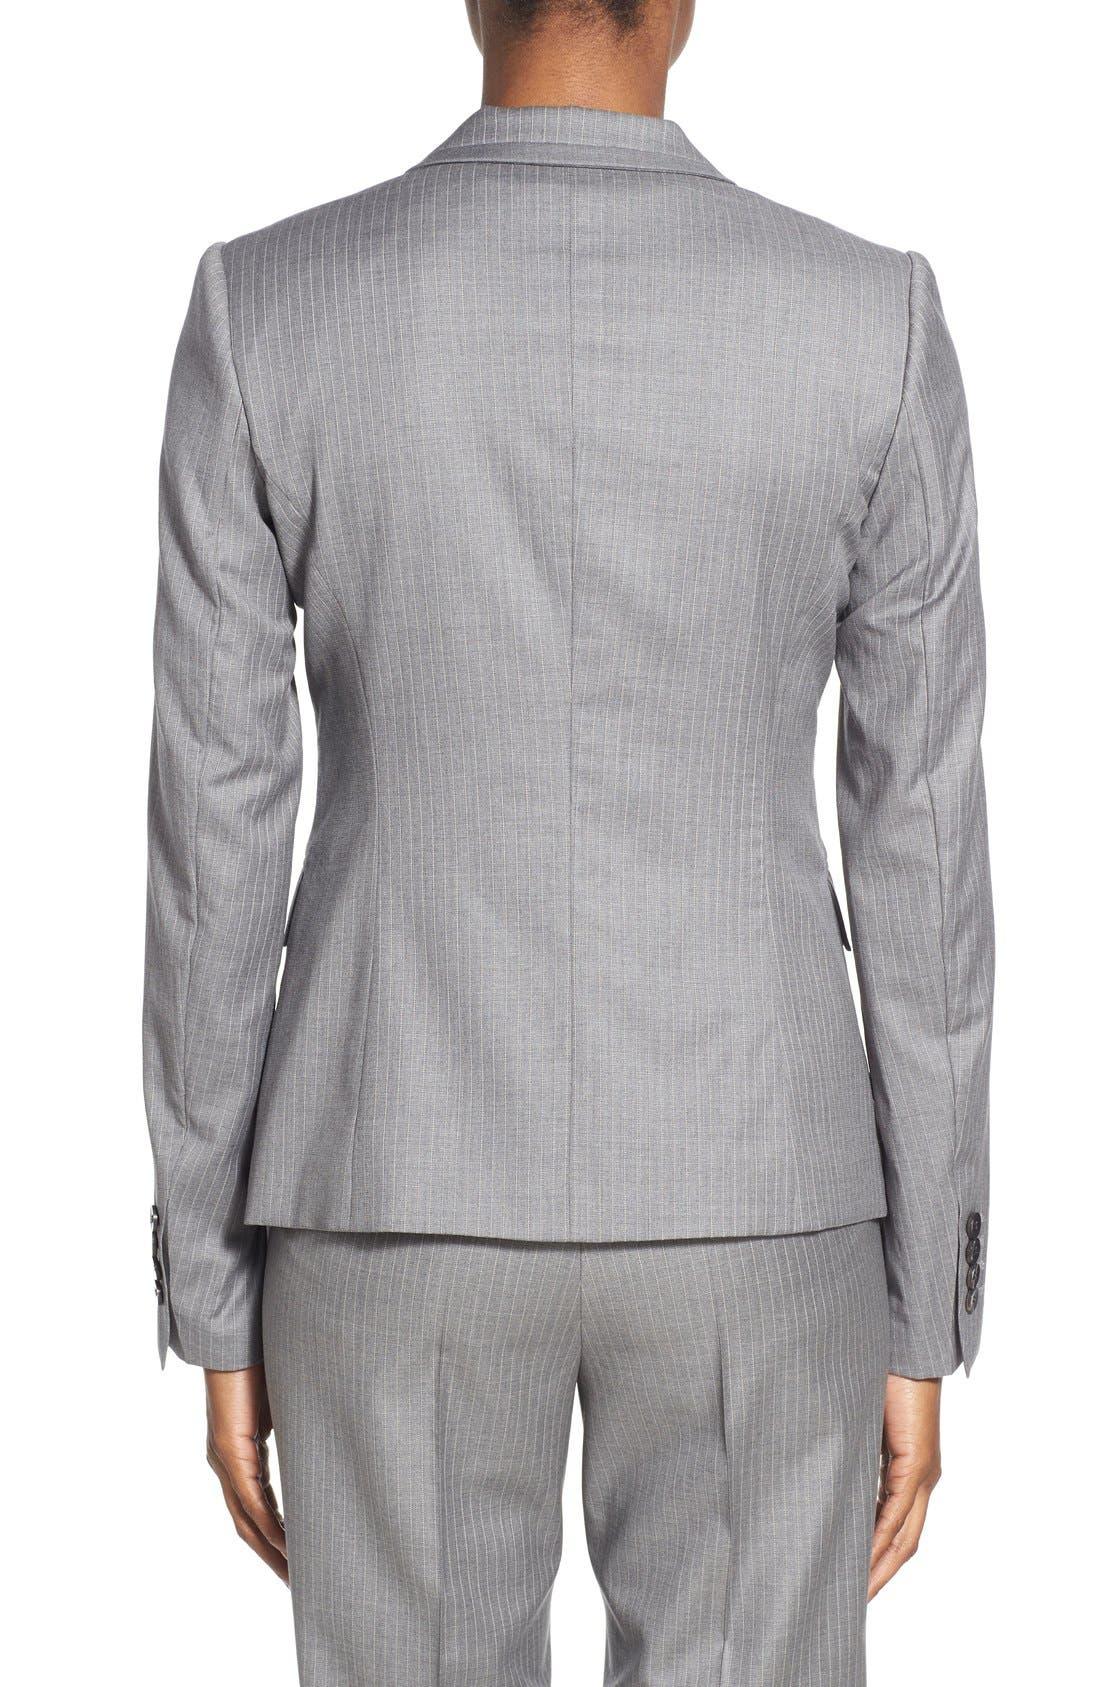 'Jelenna' Pinstripe One-Button Suit Jacket,                             Alternate thumbnail 5, color,                             060